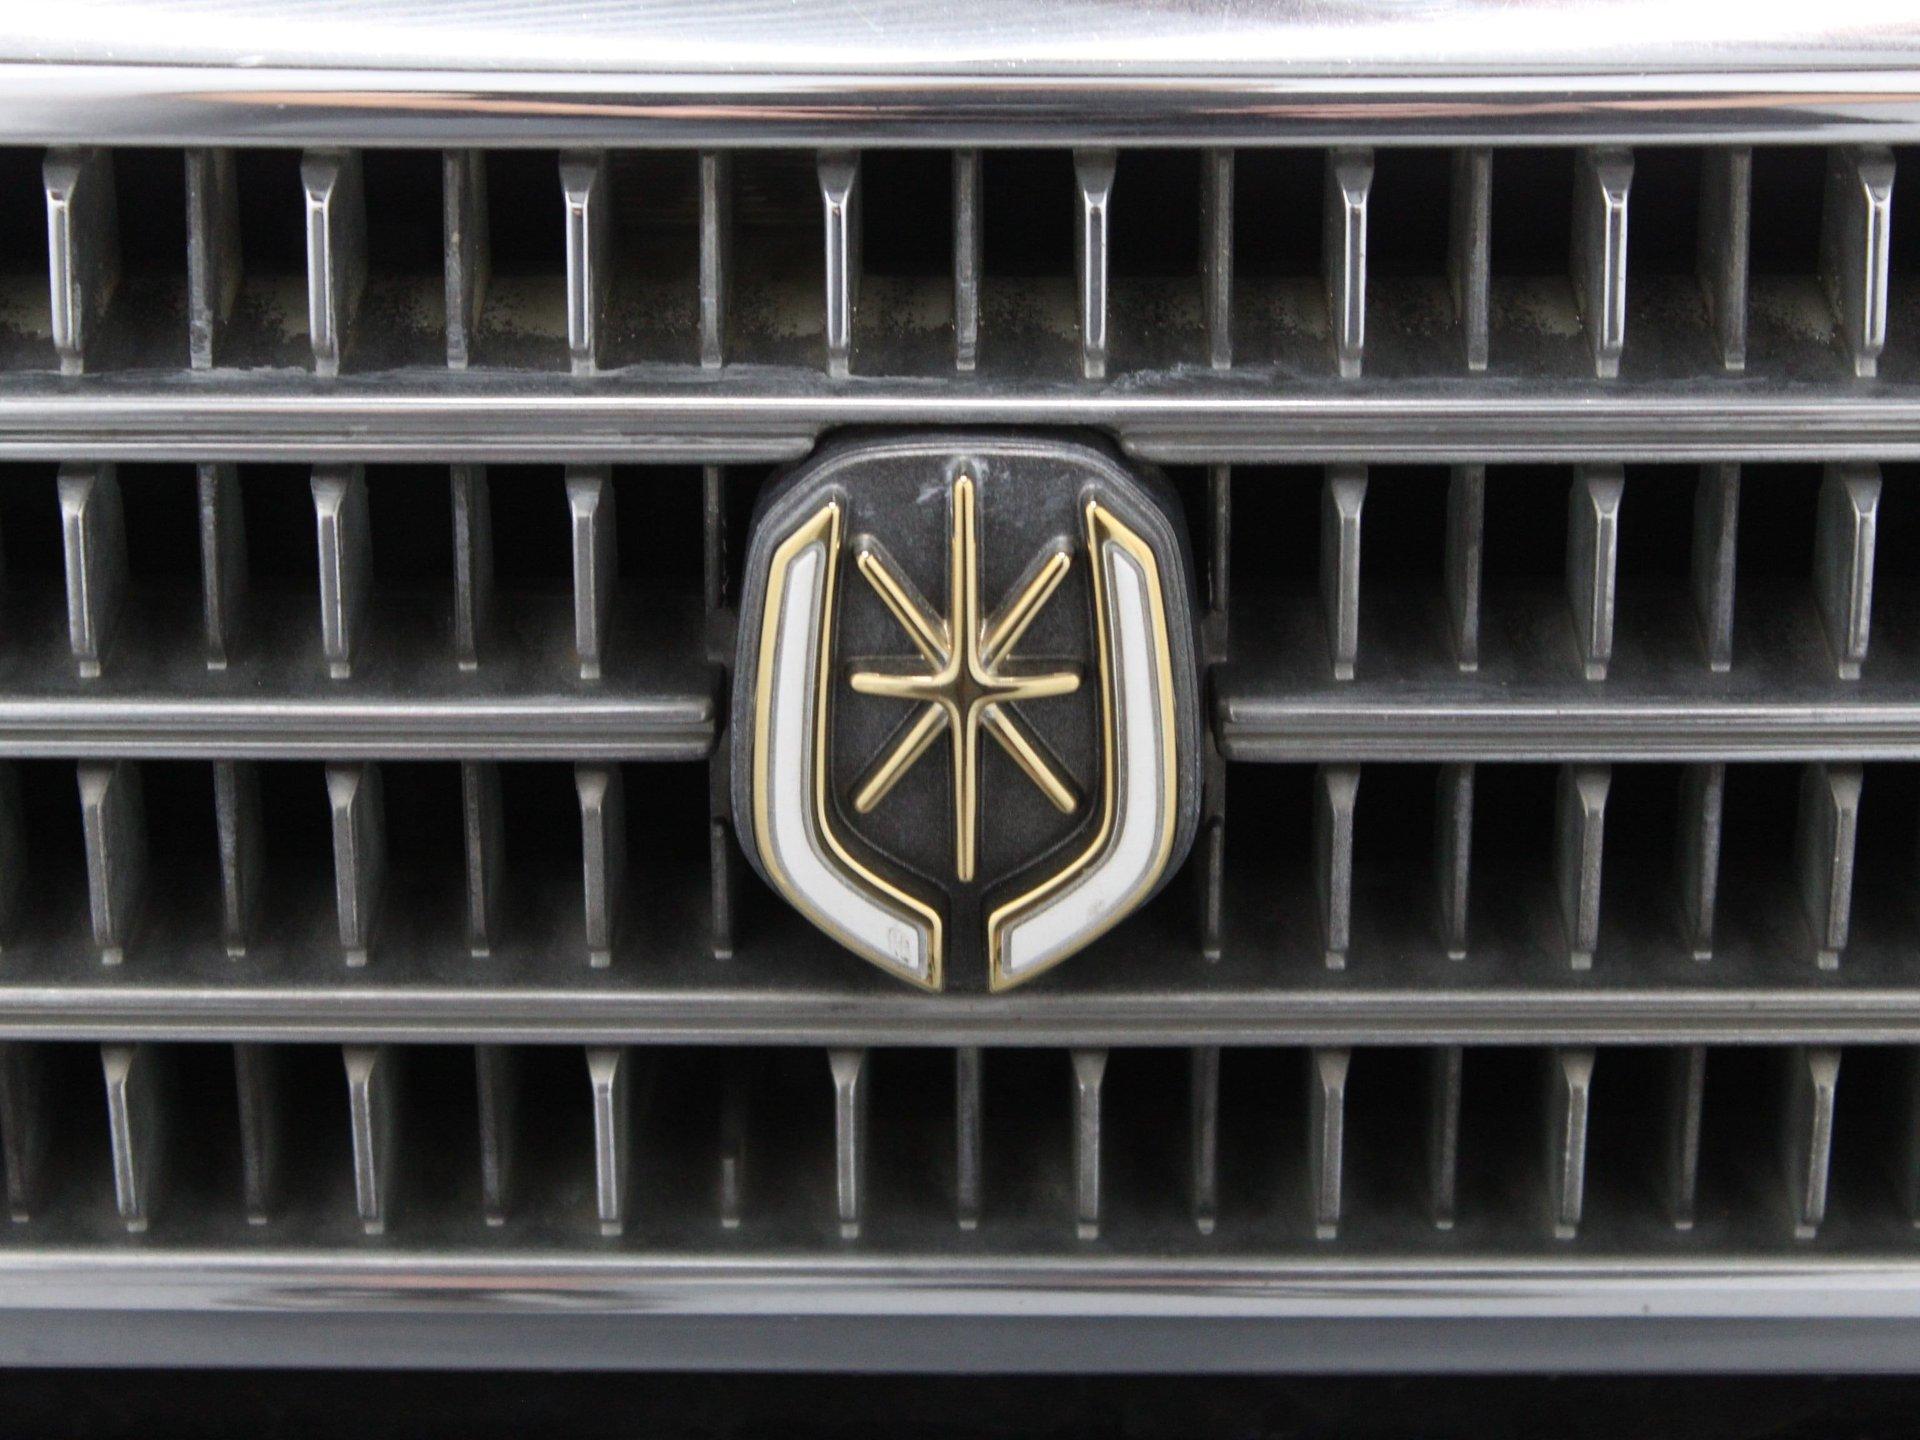 1994 Toyota Mark II